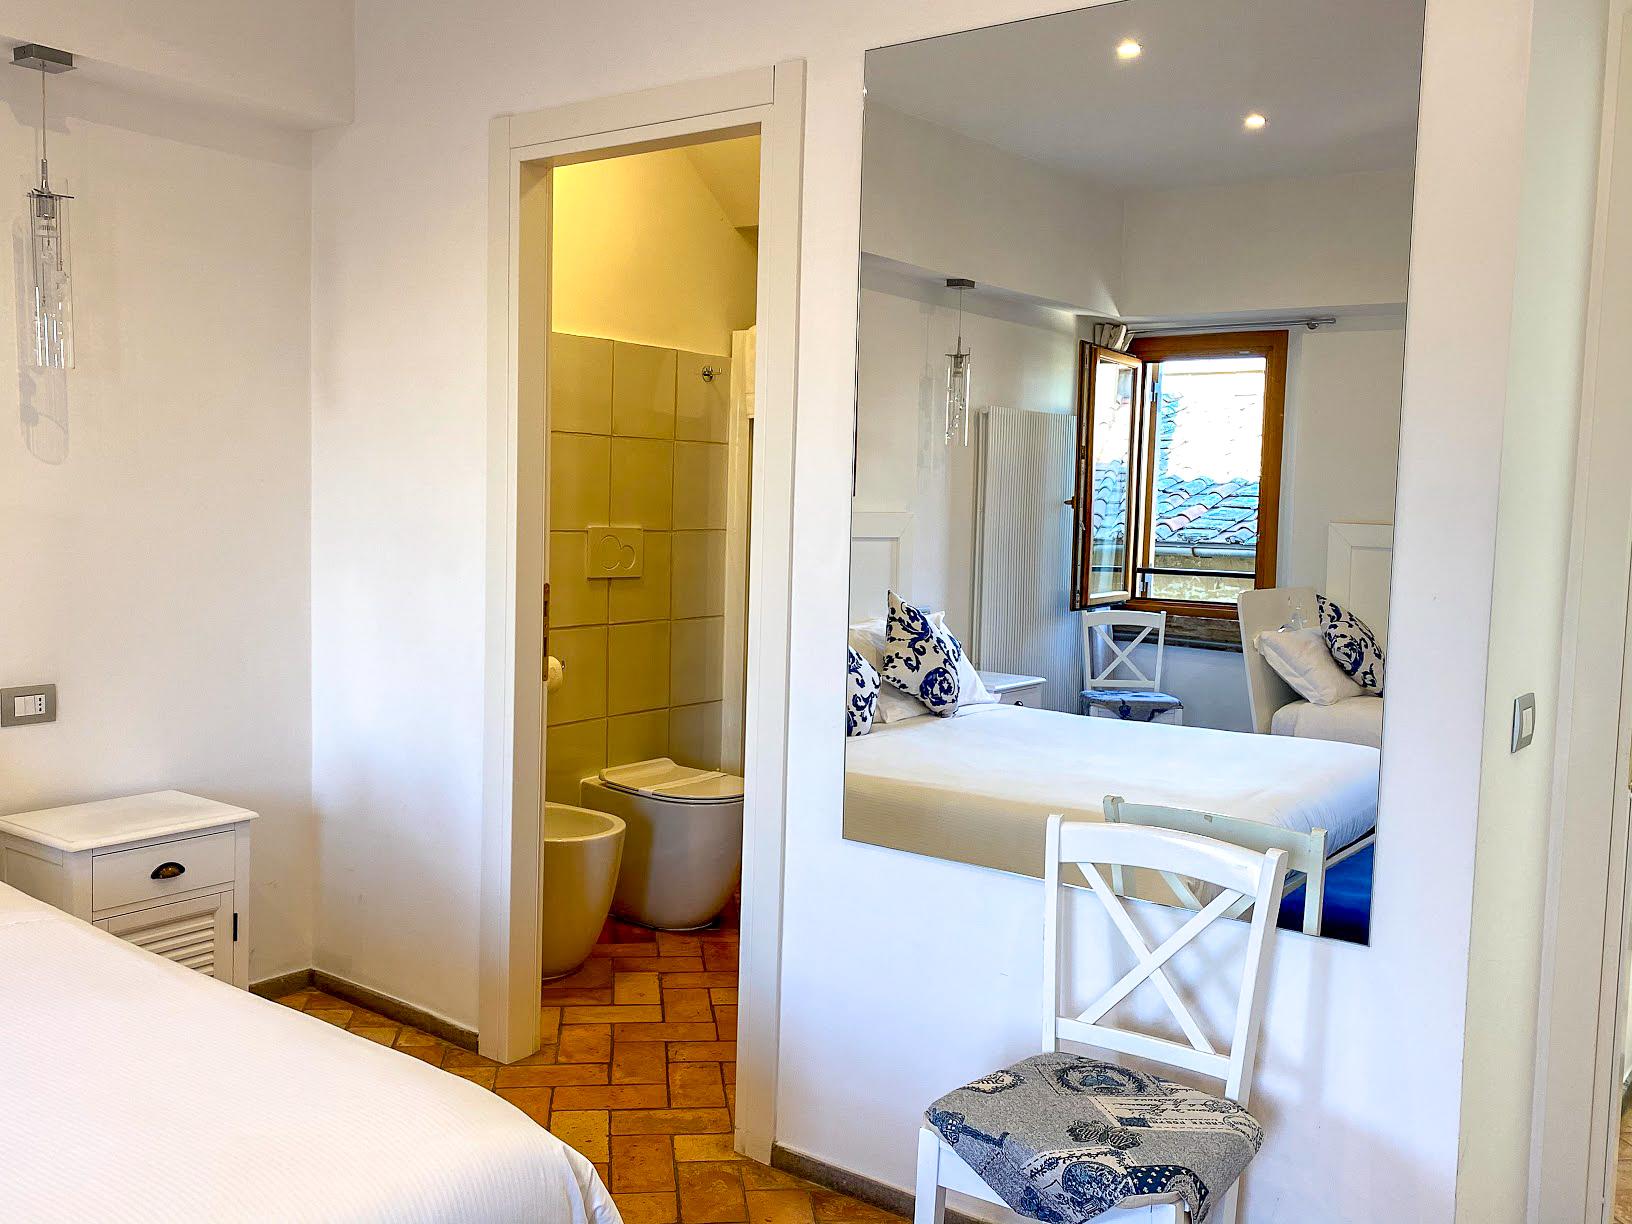 white walls in the bedroom and bathroom in Atlantis Inn B&B, Castel Gandolfo, Italy